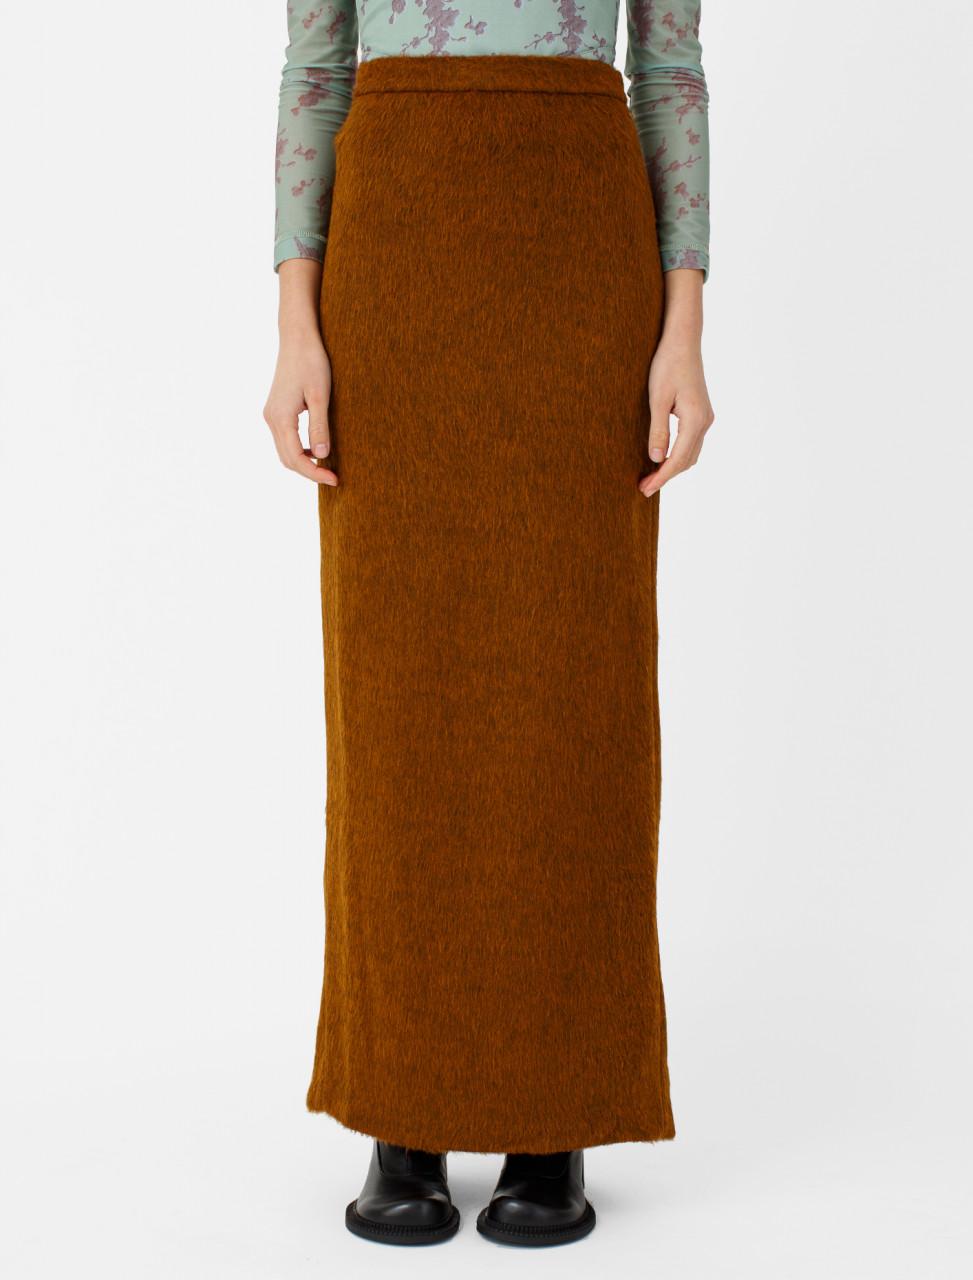 Fuzz Skirt